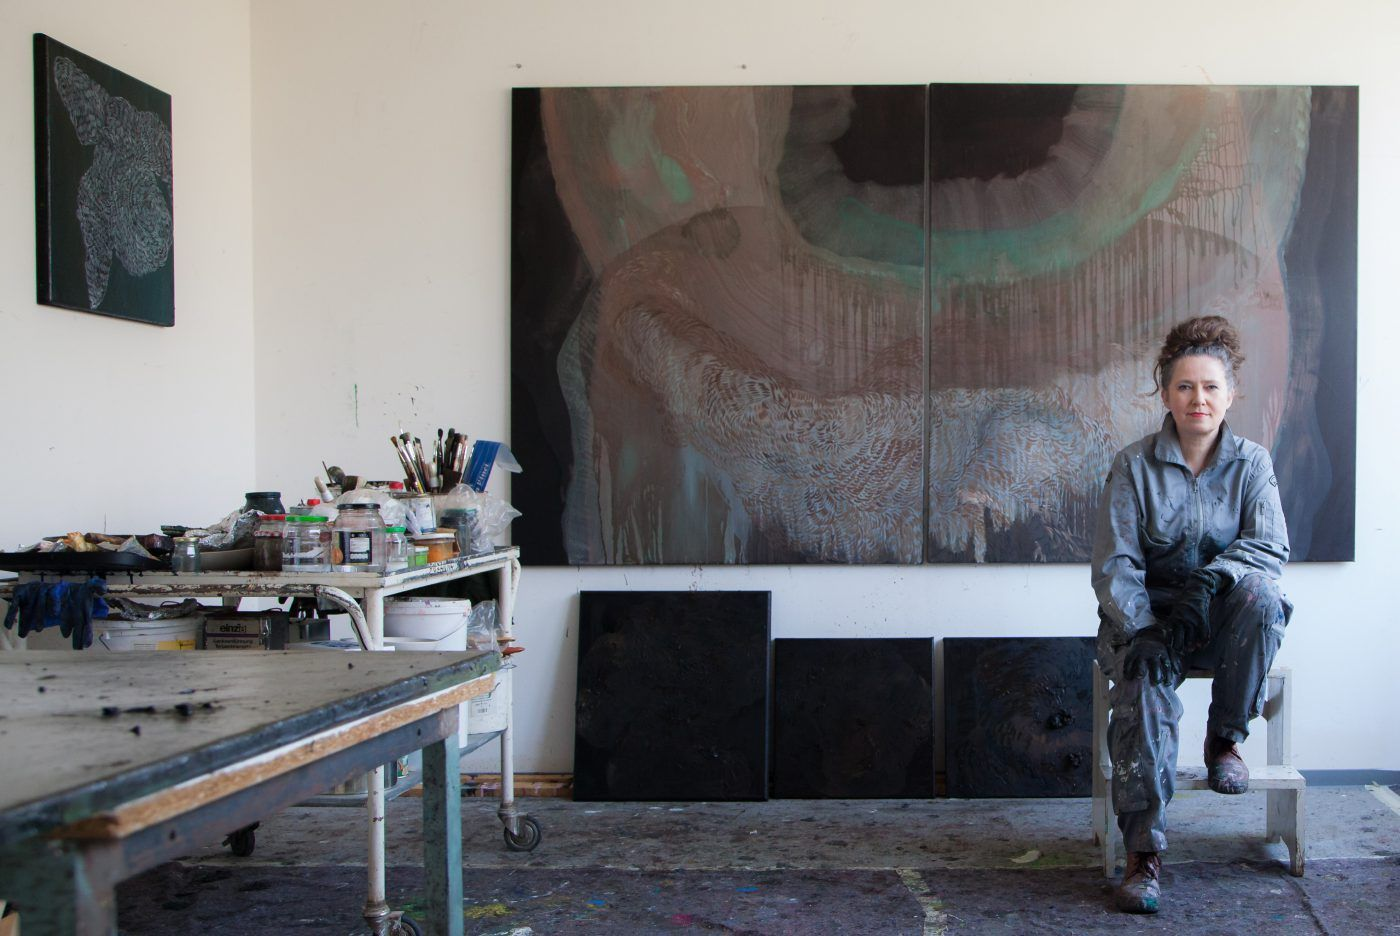 Offenes Atelier Ganztagig Vorerst Abgesagt Wg Coronakrise Sa 23 05 2020 Kunsthalle Atelier Burkamp